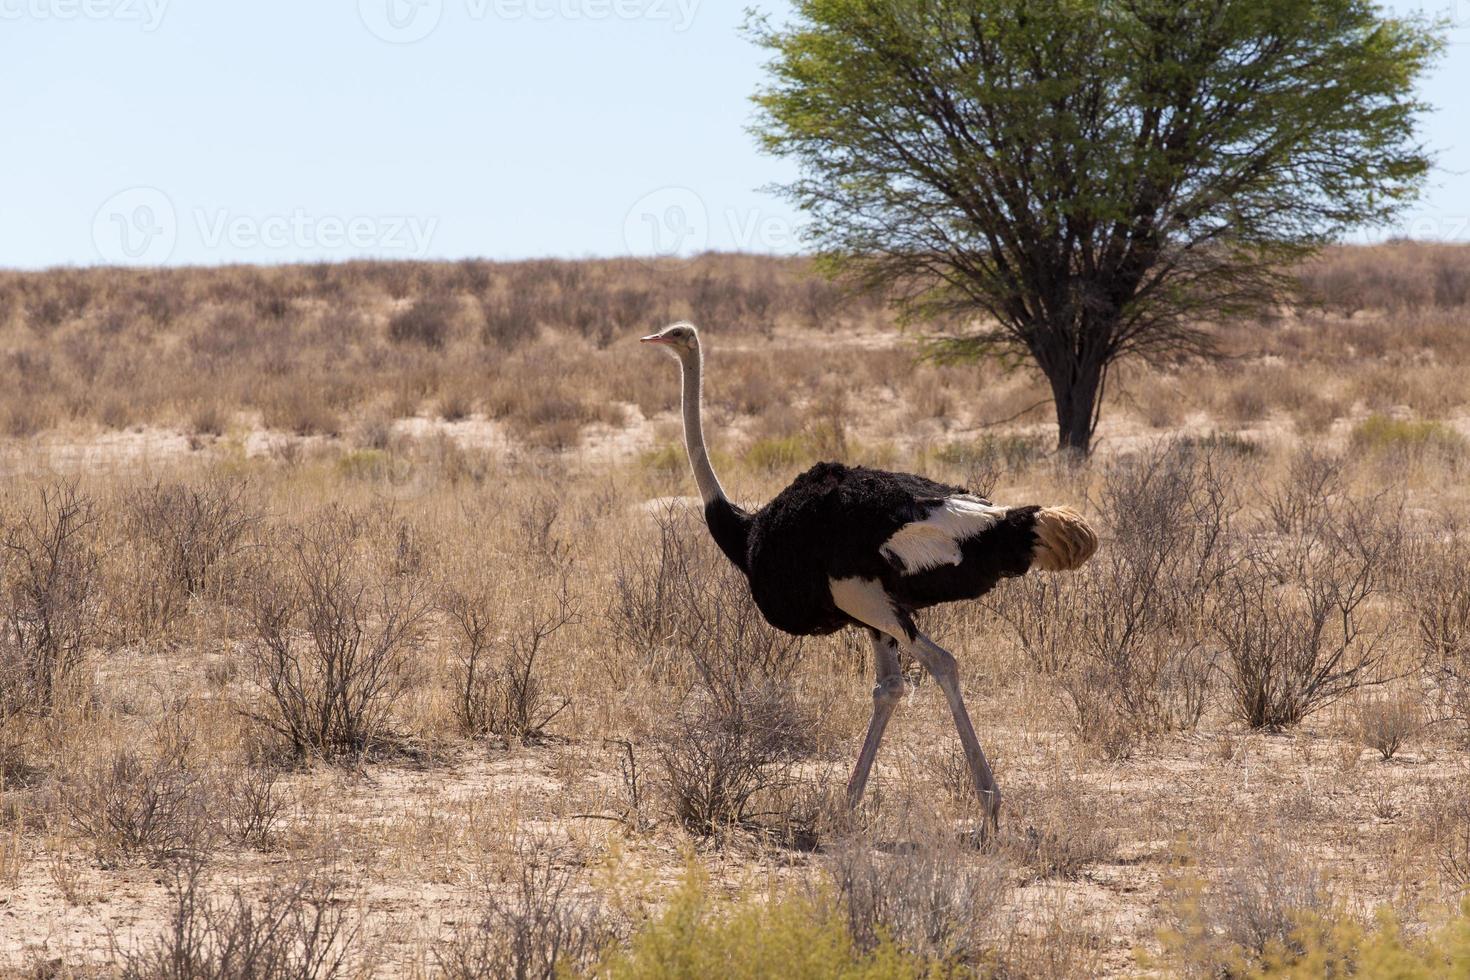 Strauß struthio camelus, in kgalagadi, Südafrika foto